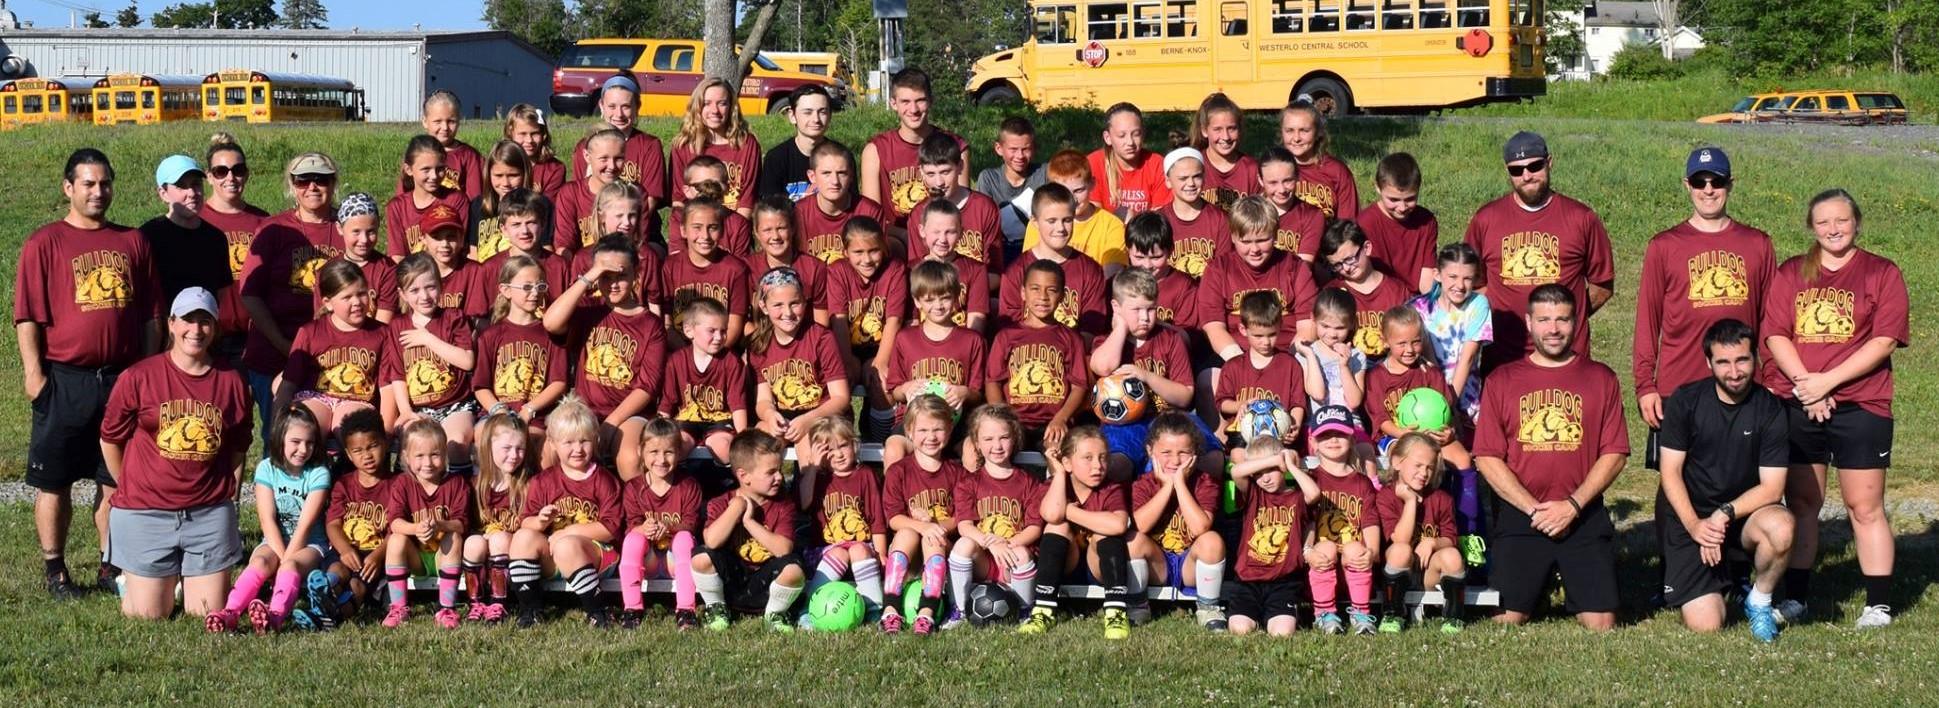 Summer Soccer Camp 2018.jpg